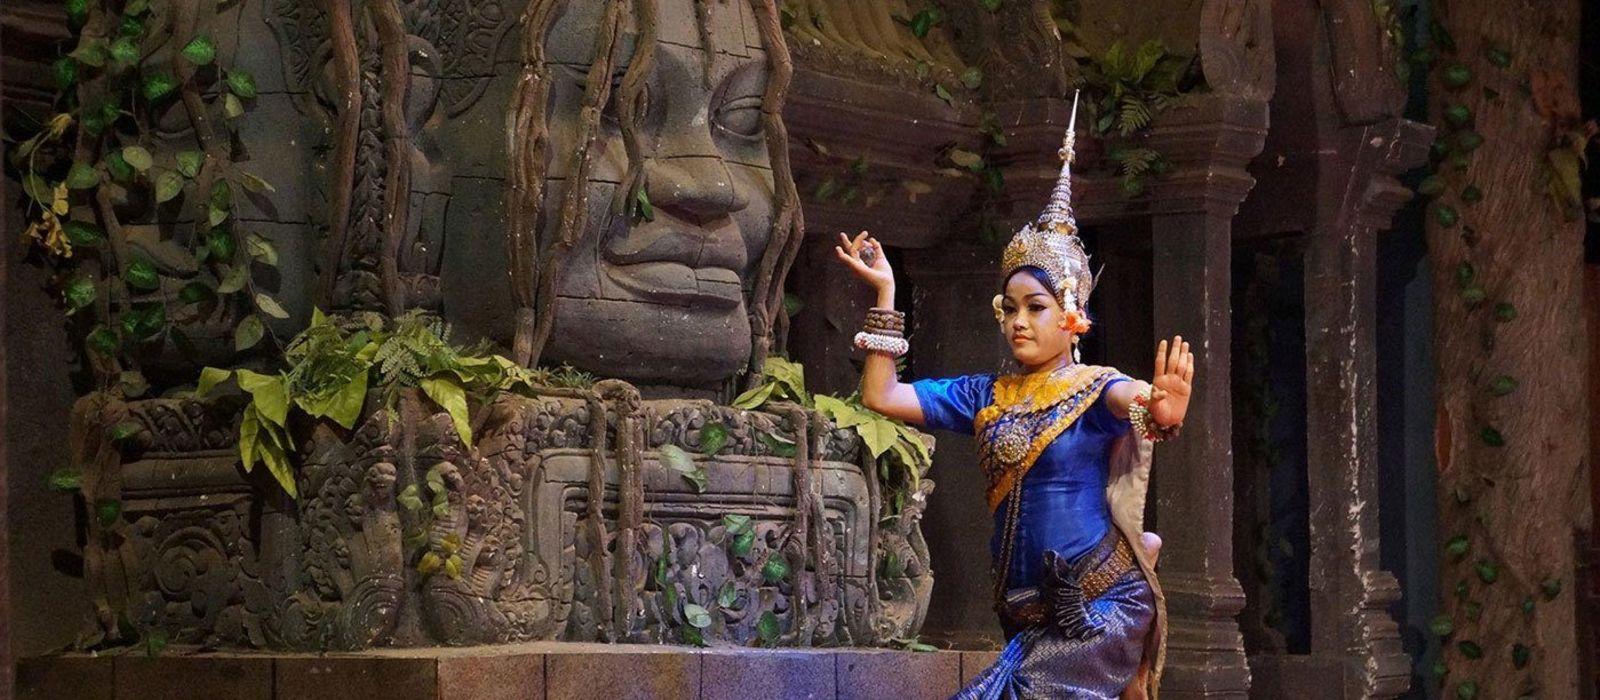 Rundreise Vietnam Kambodscha – Mekong & mehr Urlaub 1